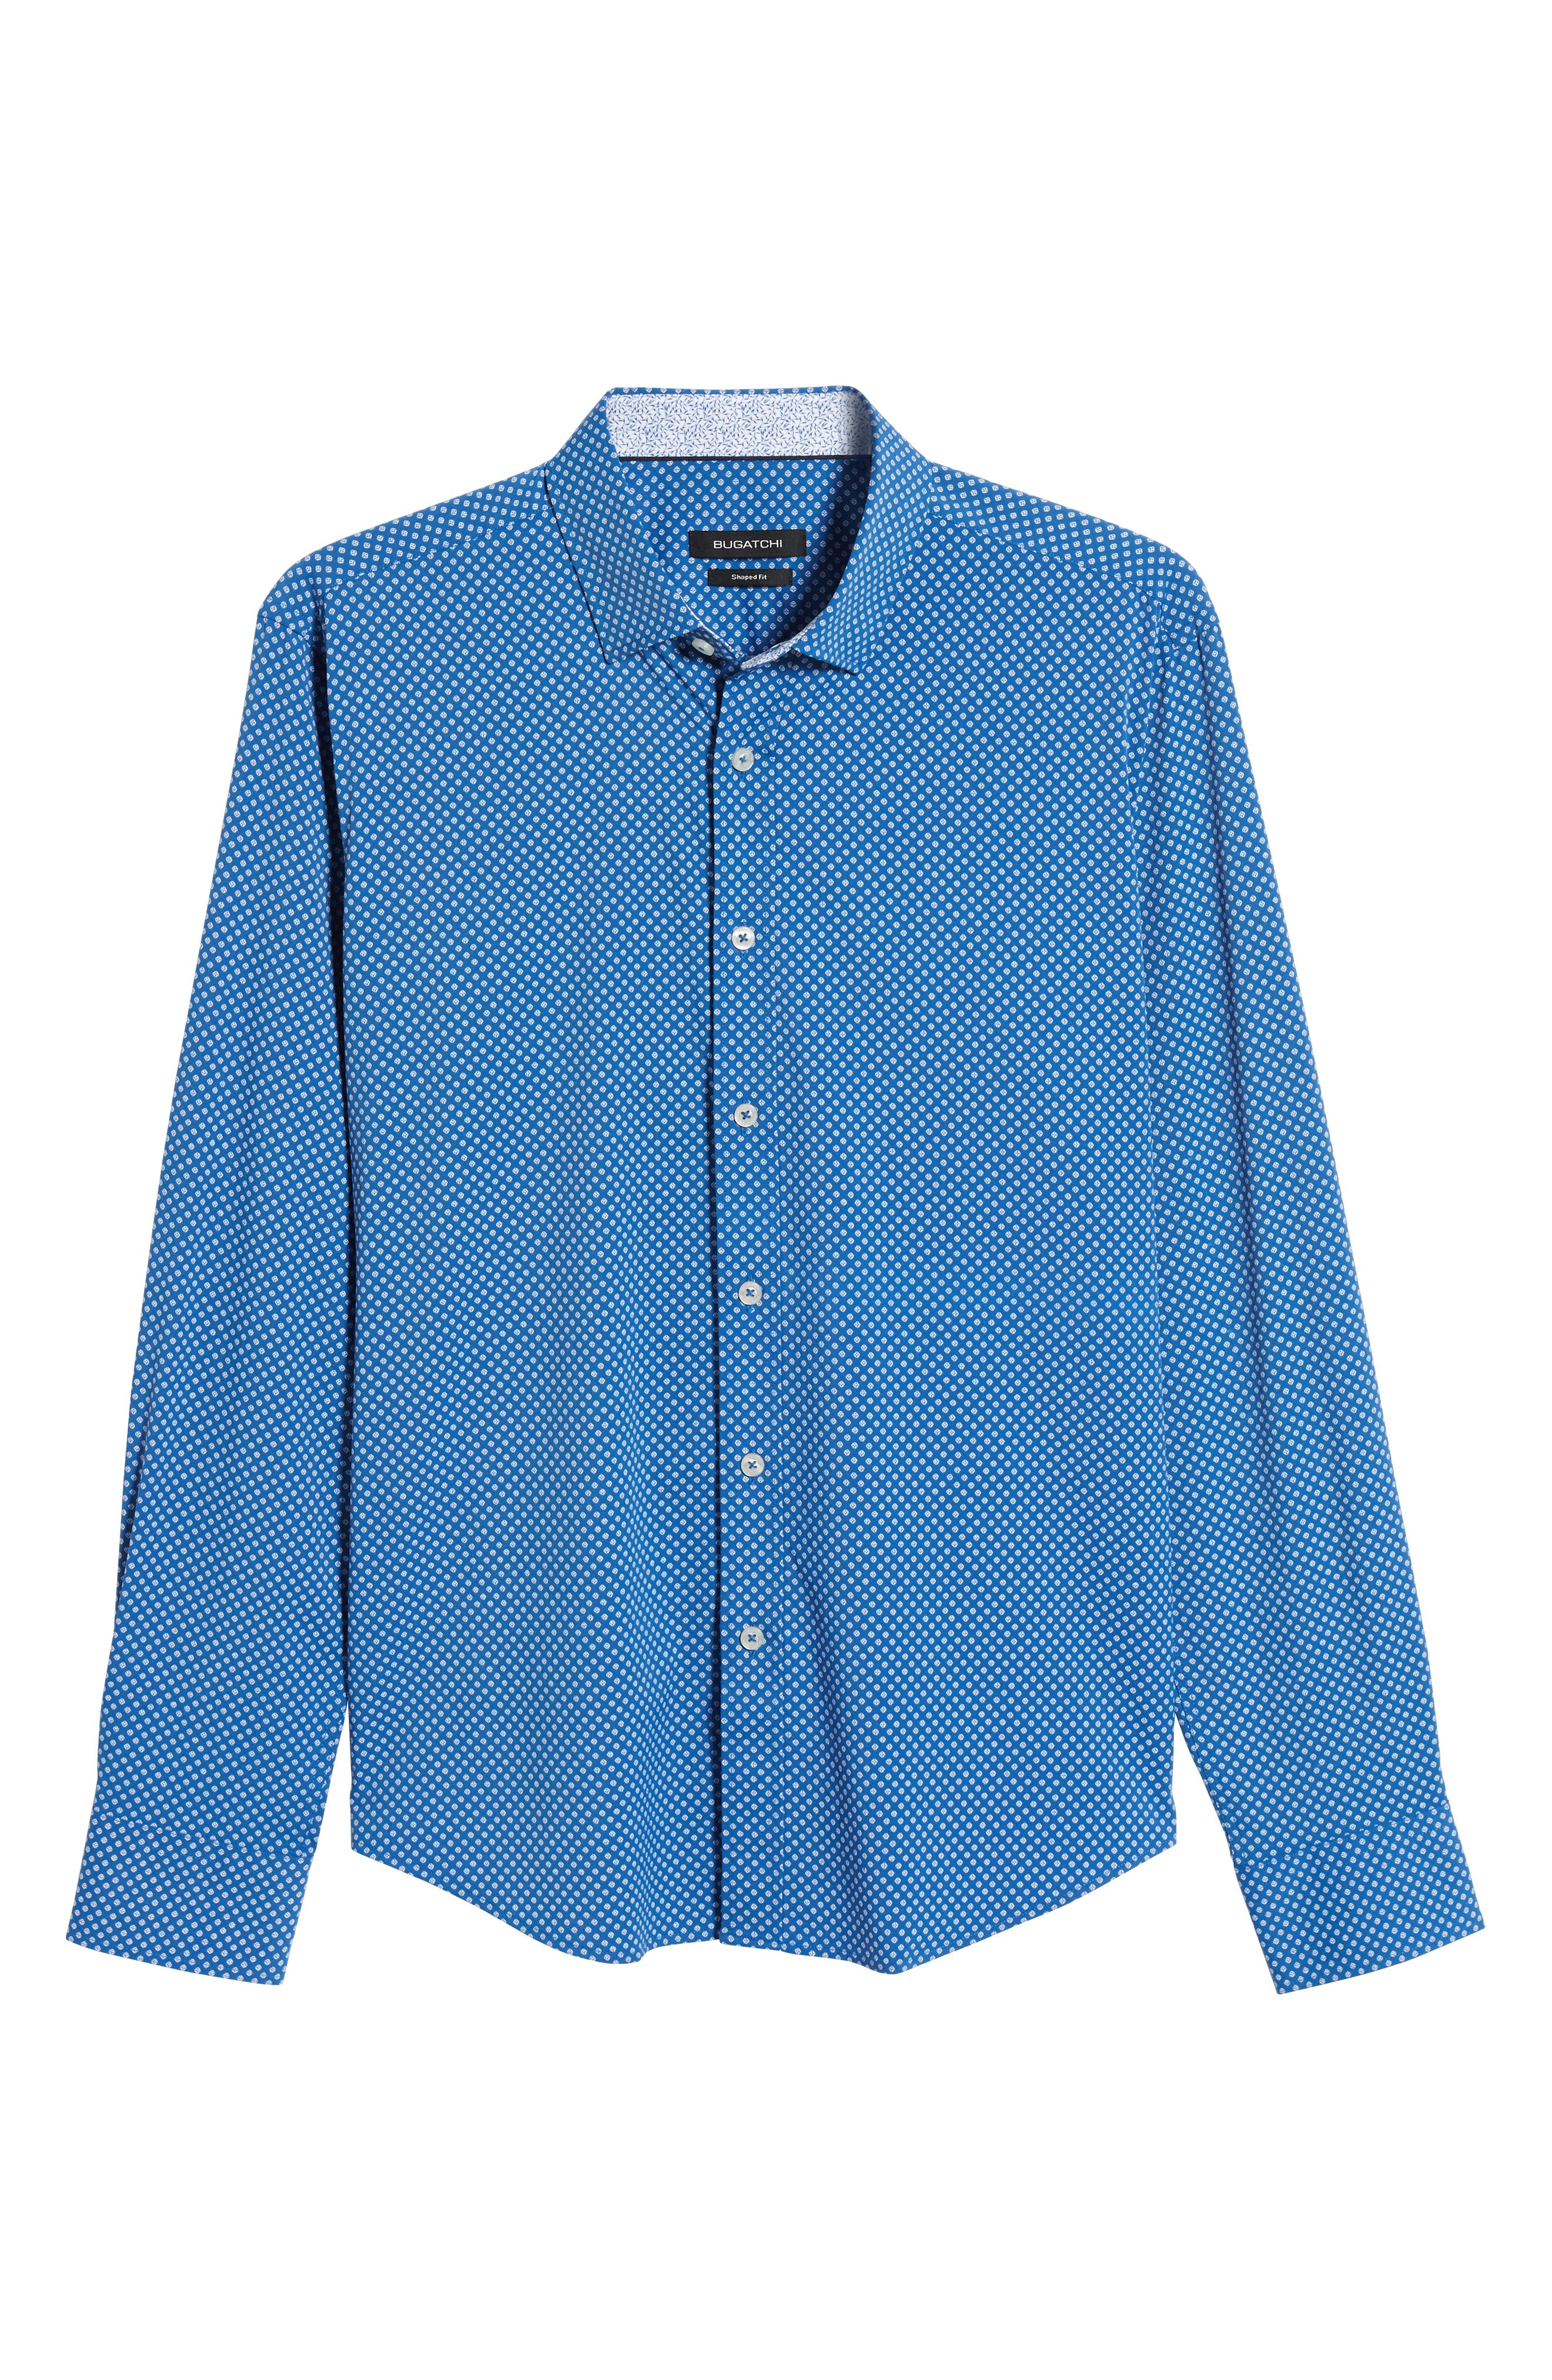 BUGATCHI, Shaped Fit Print Performance Sport Shirt, Alternate thumbnail 5, color, NAVY